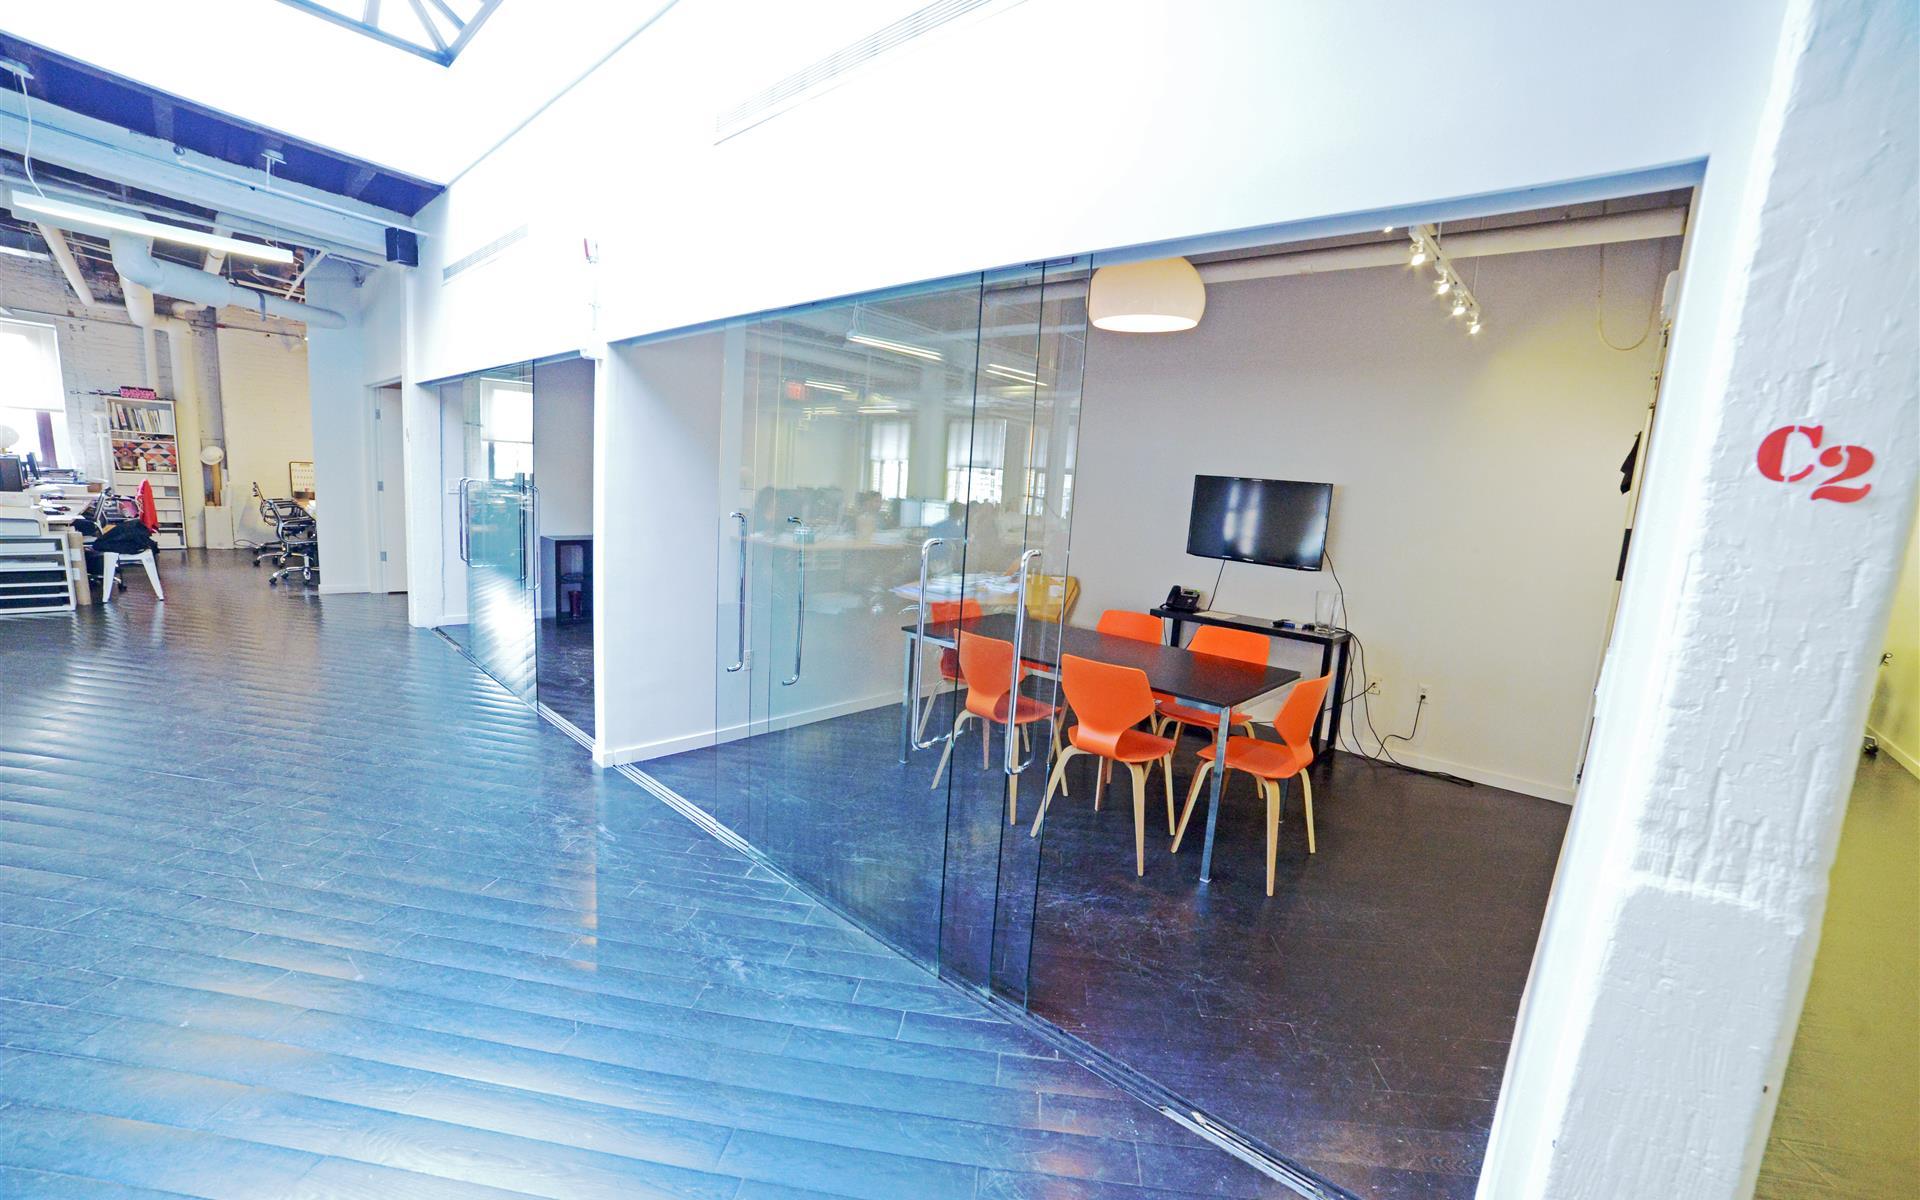 2P Tribeca - NYC - Team Office at 2P Tribeca